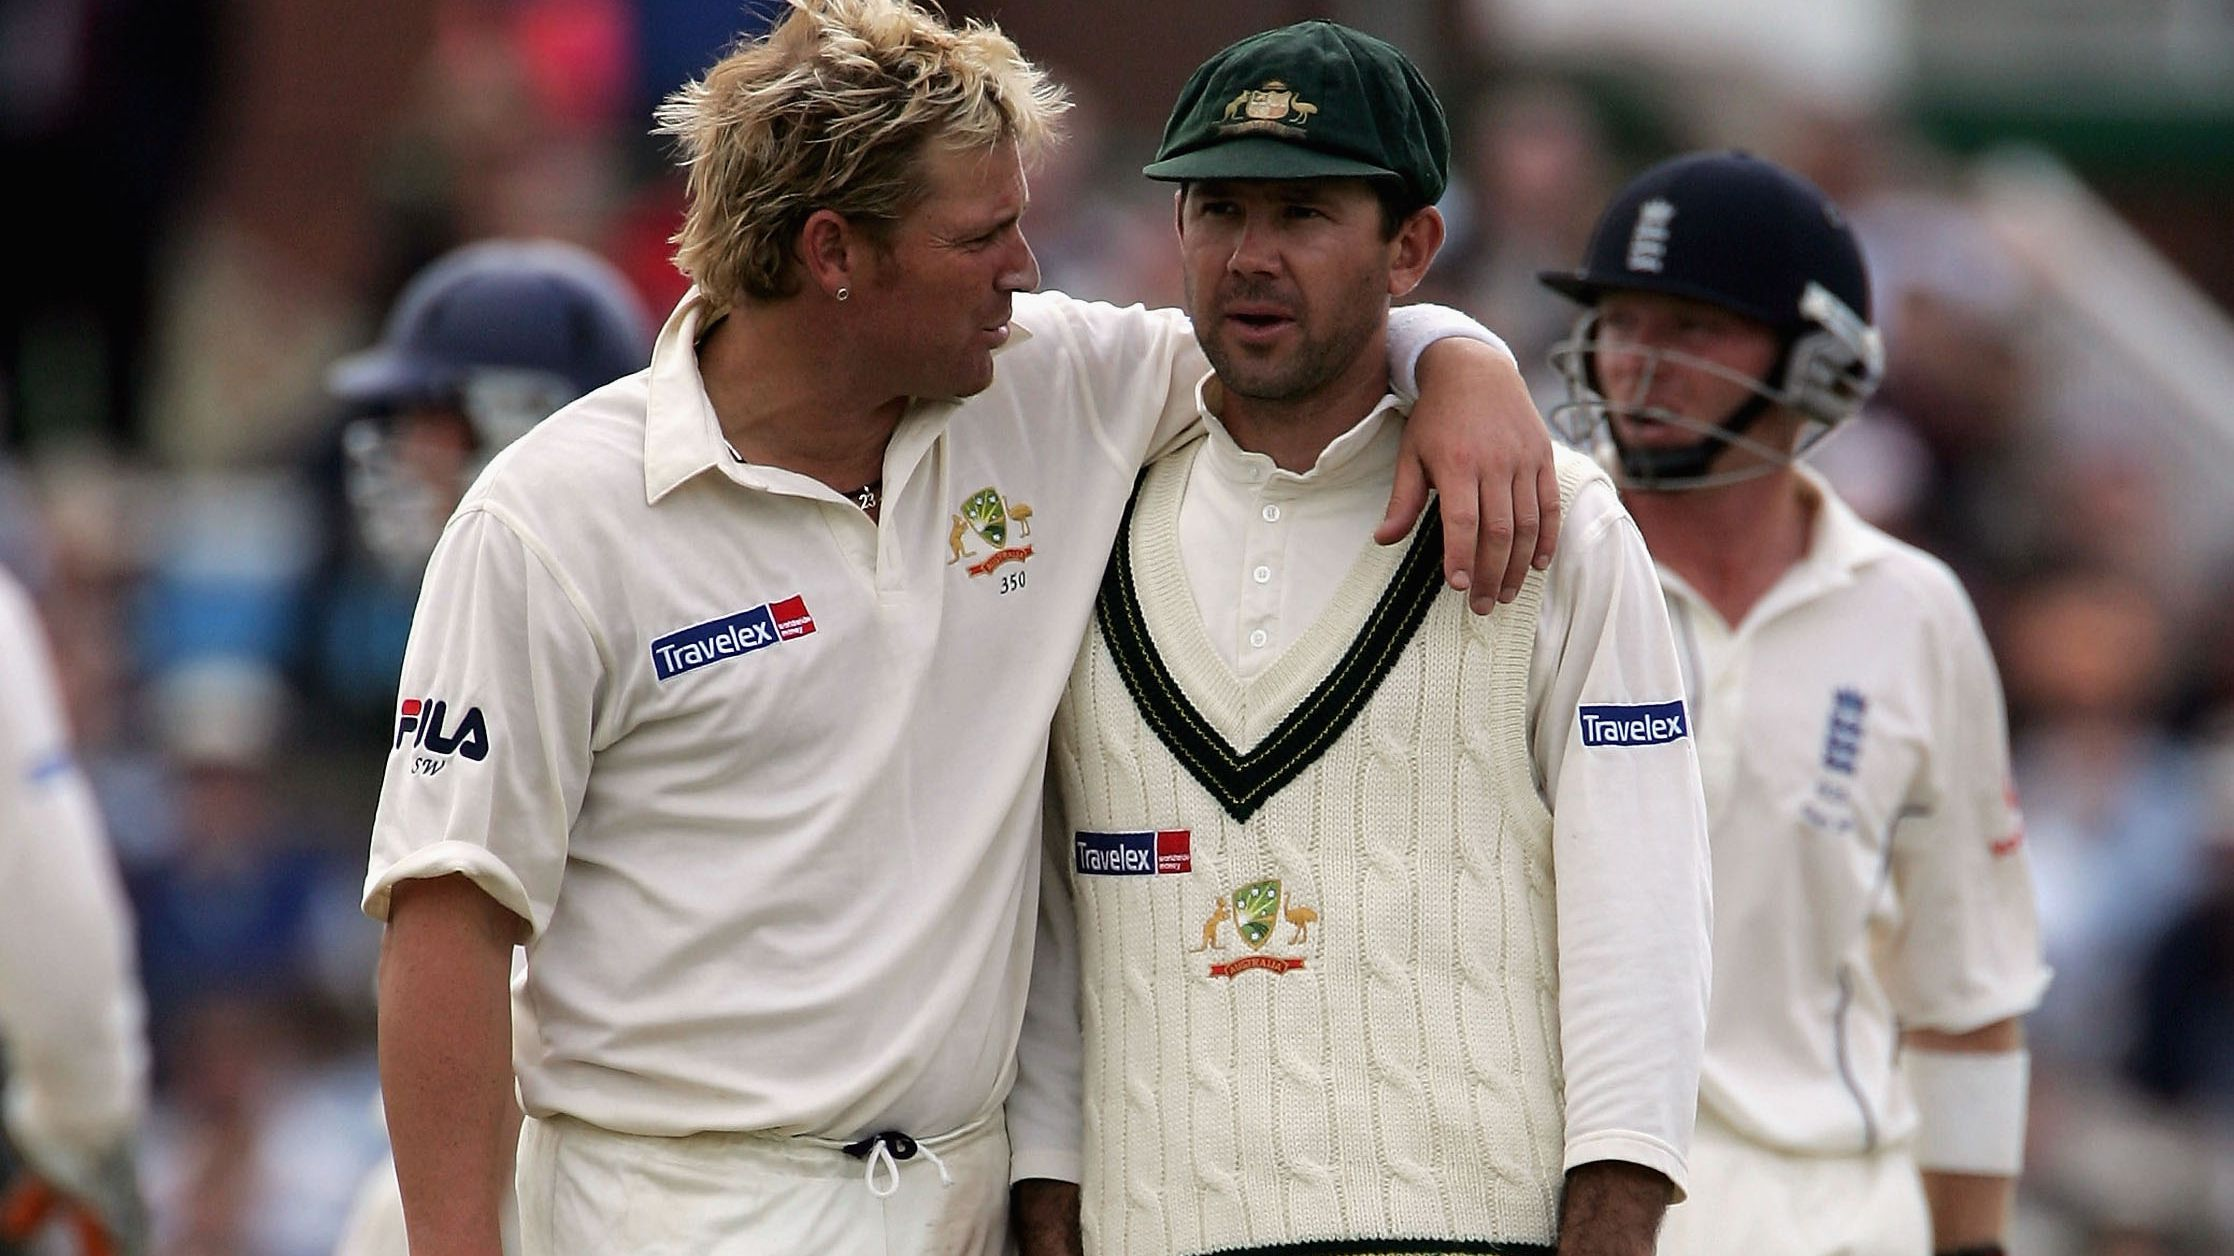 Shane Warne heaps scorn on Ricky Ponting for Edgbaston 2005 captaincy call